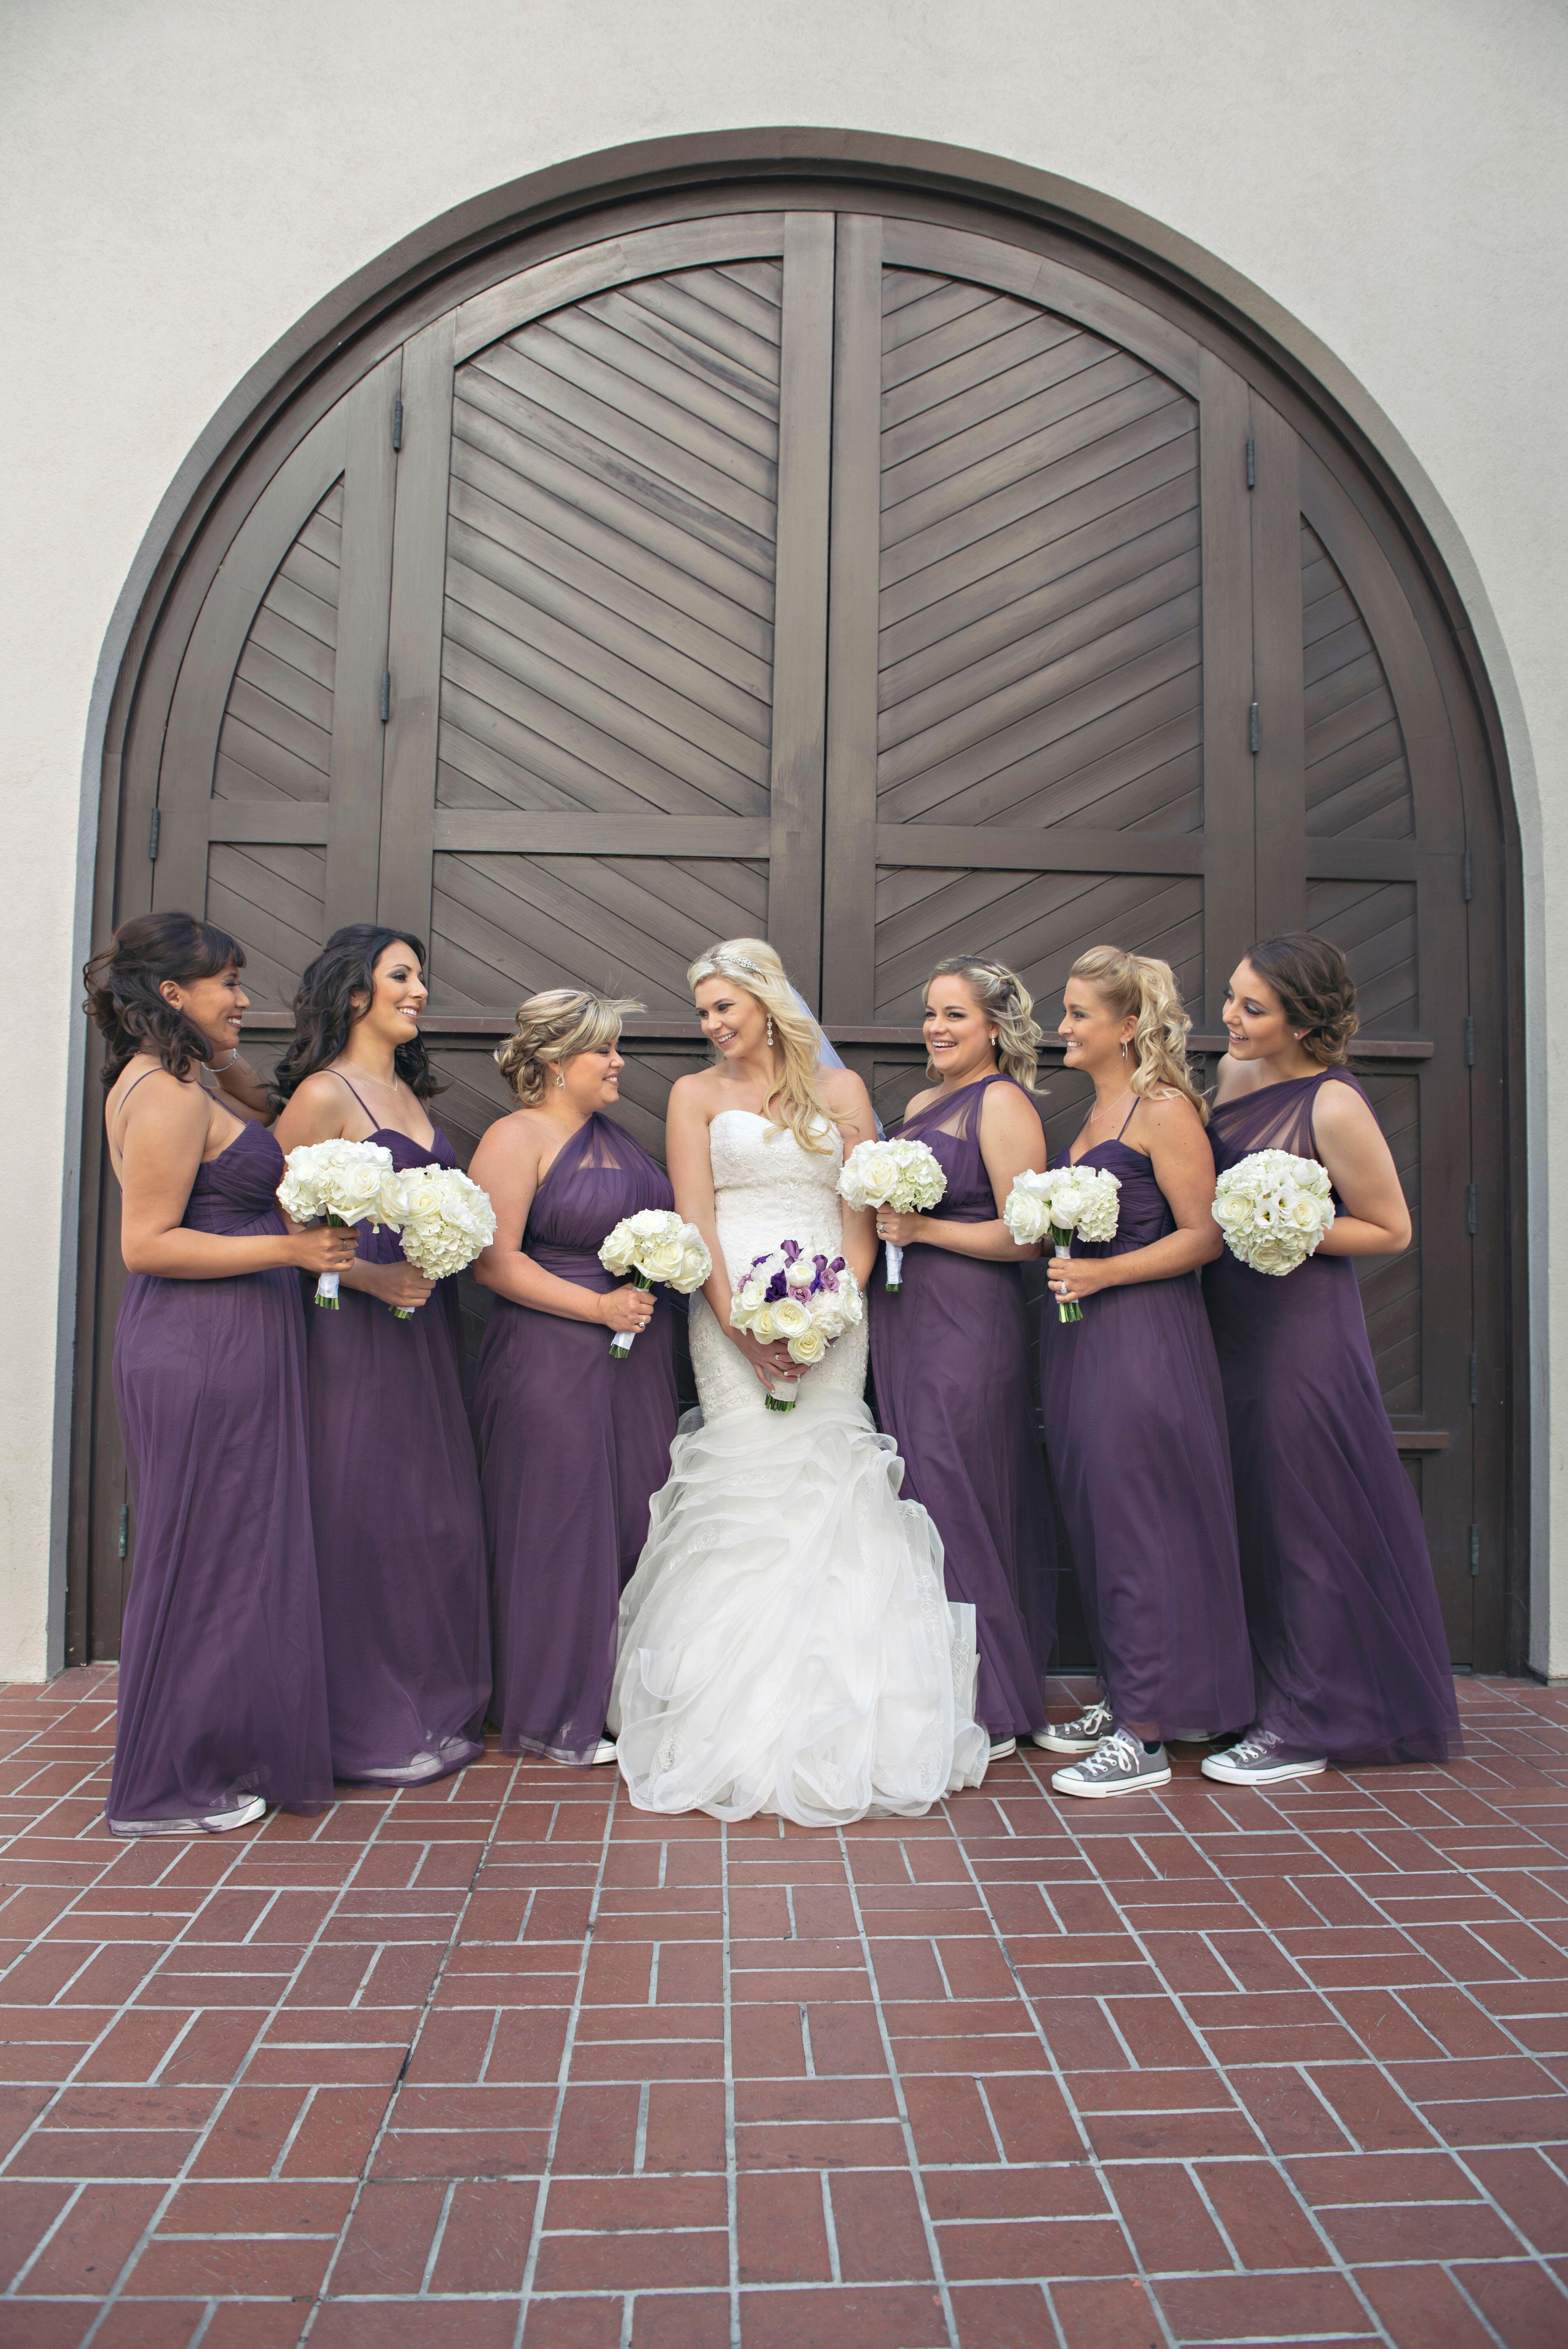 Wedding Jewelry For Bridesmaids